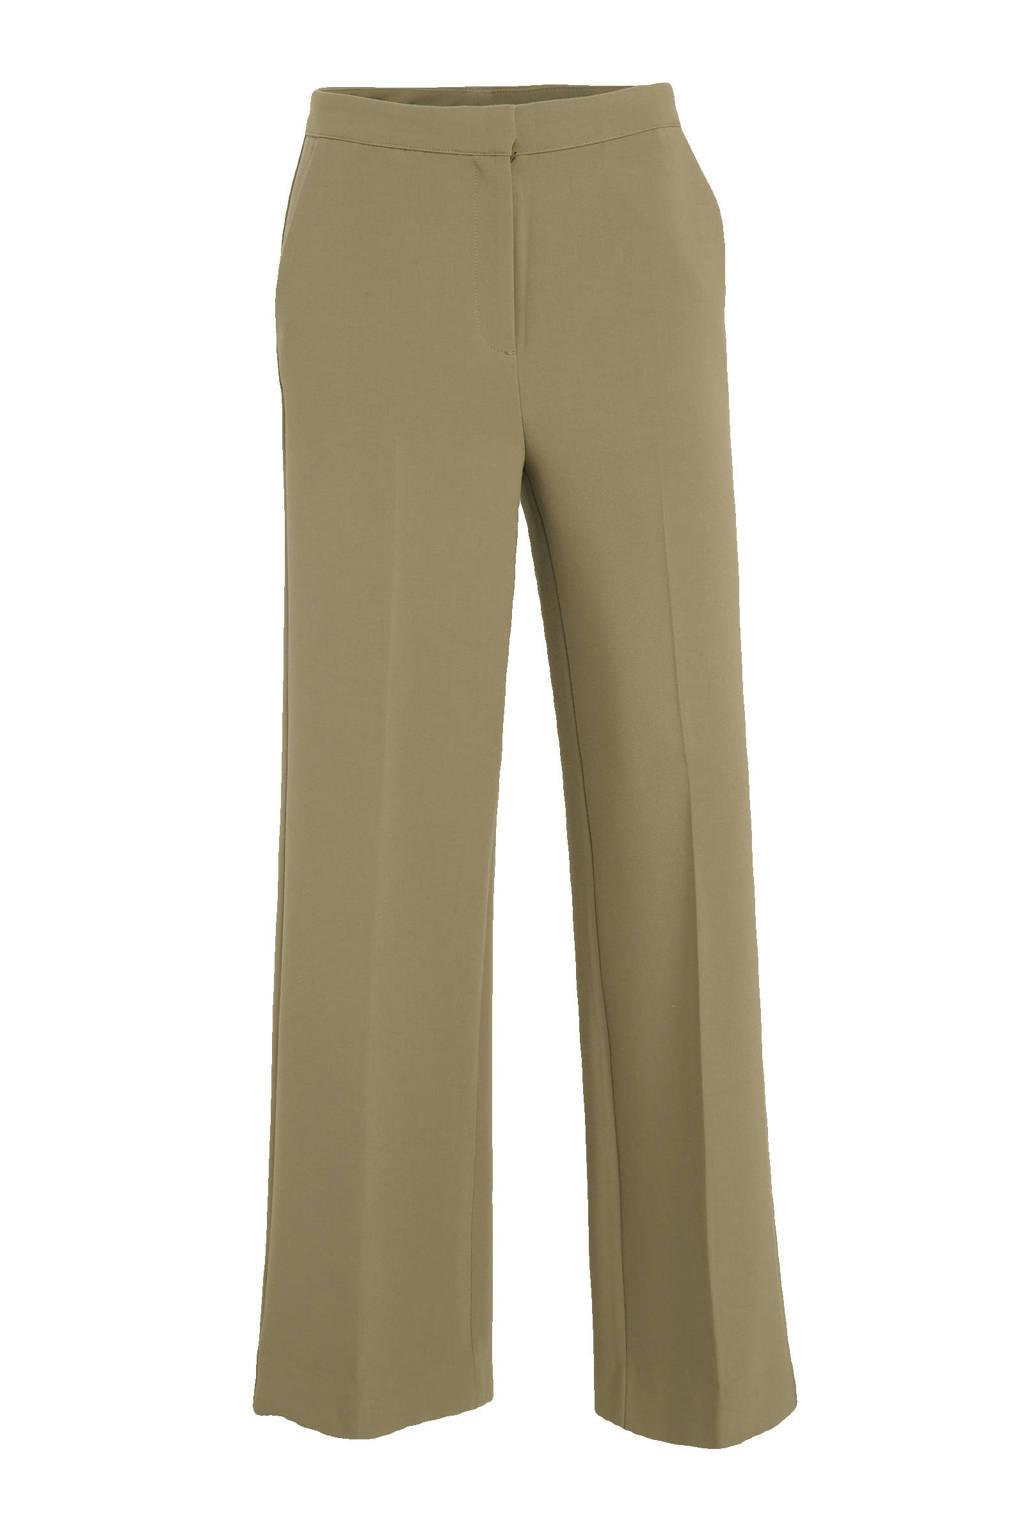 Another-Label high waist straight fit broek Moore groen, Groen